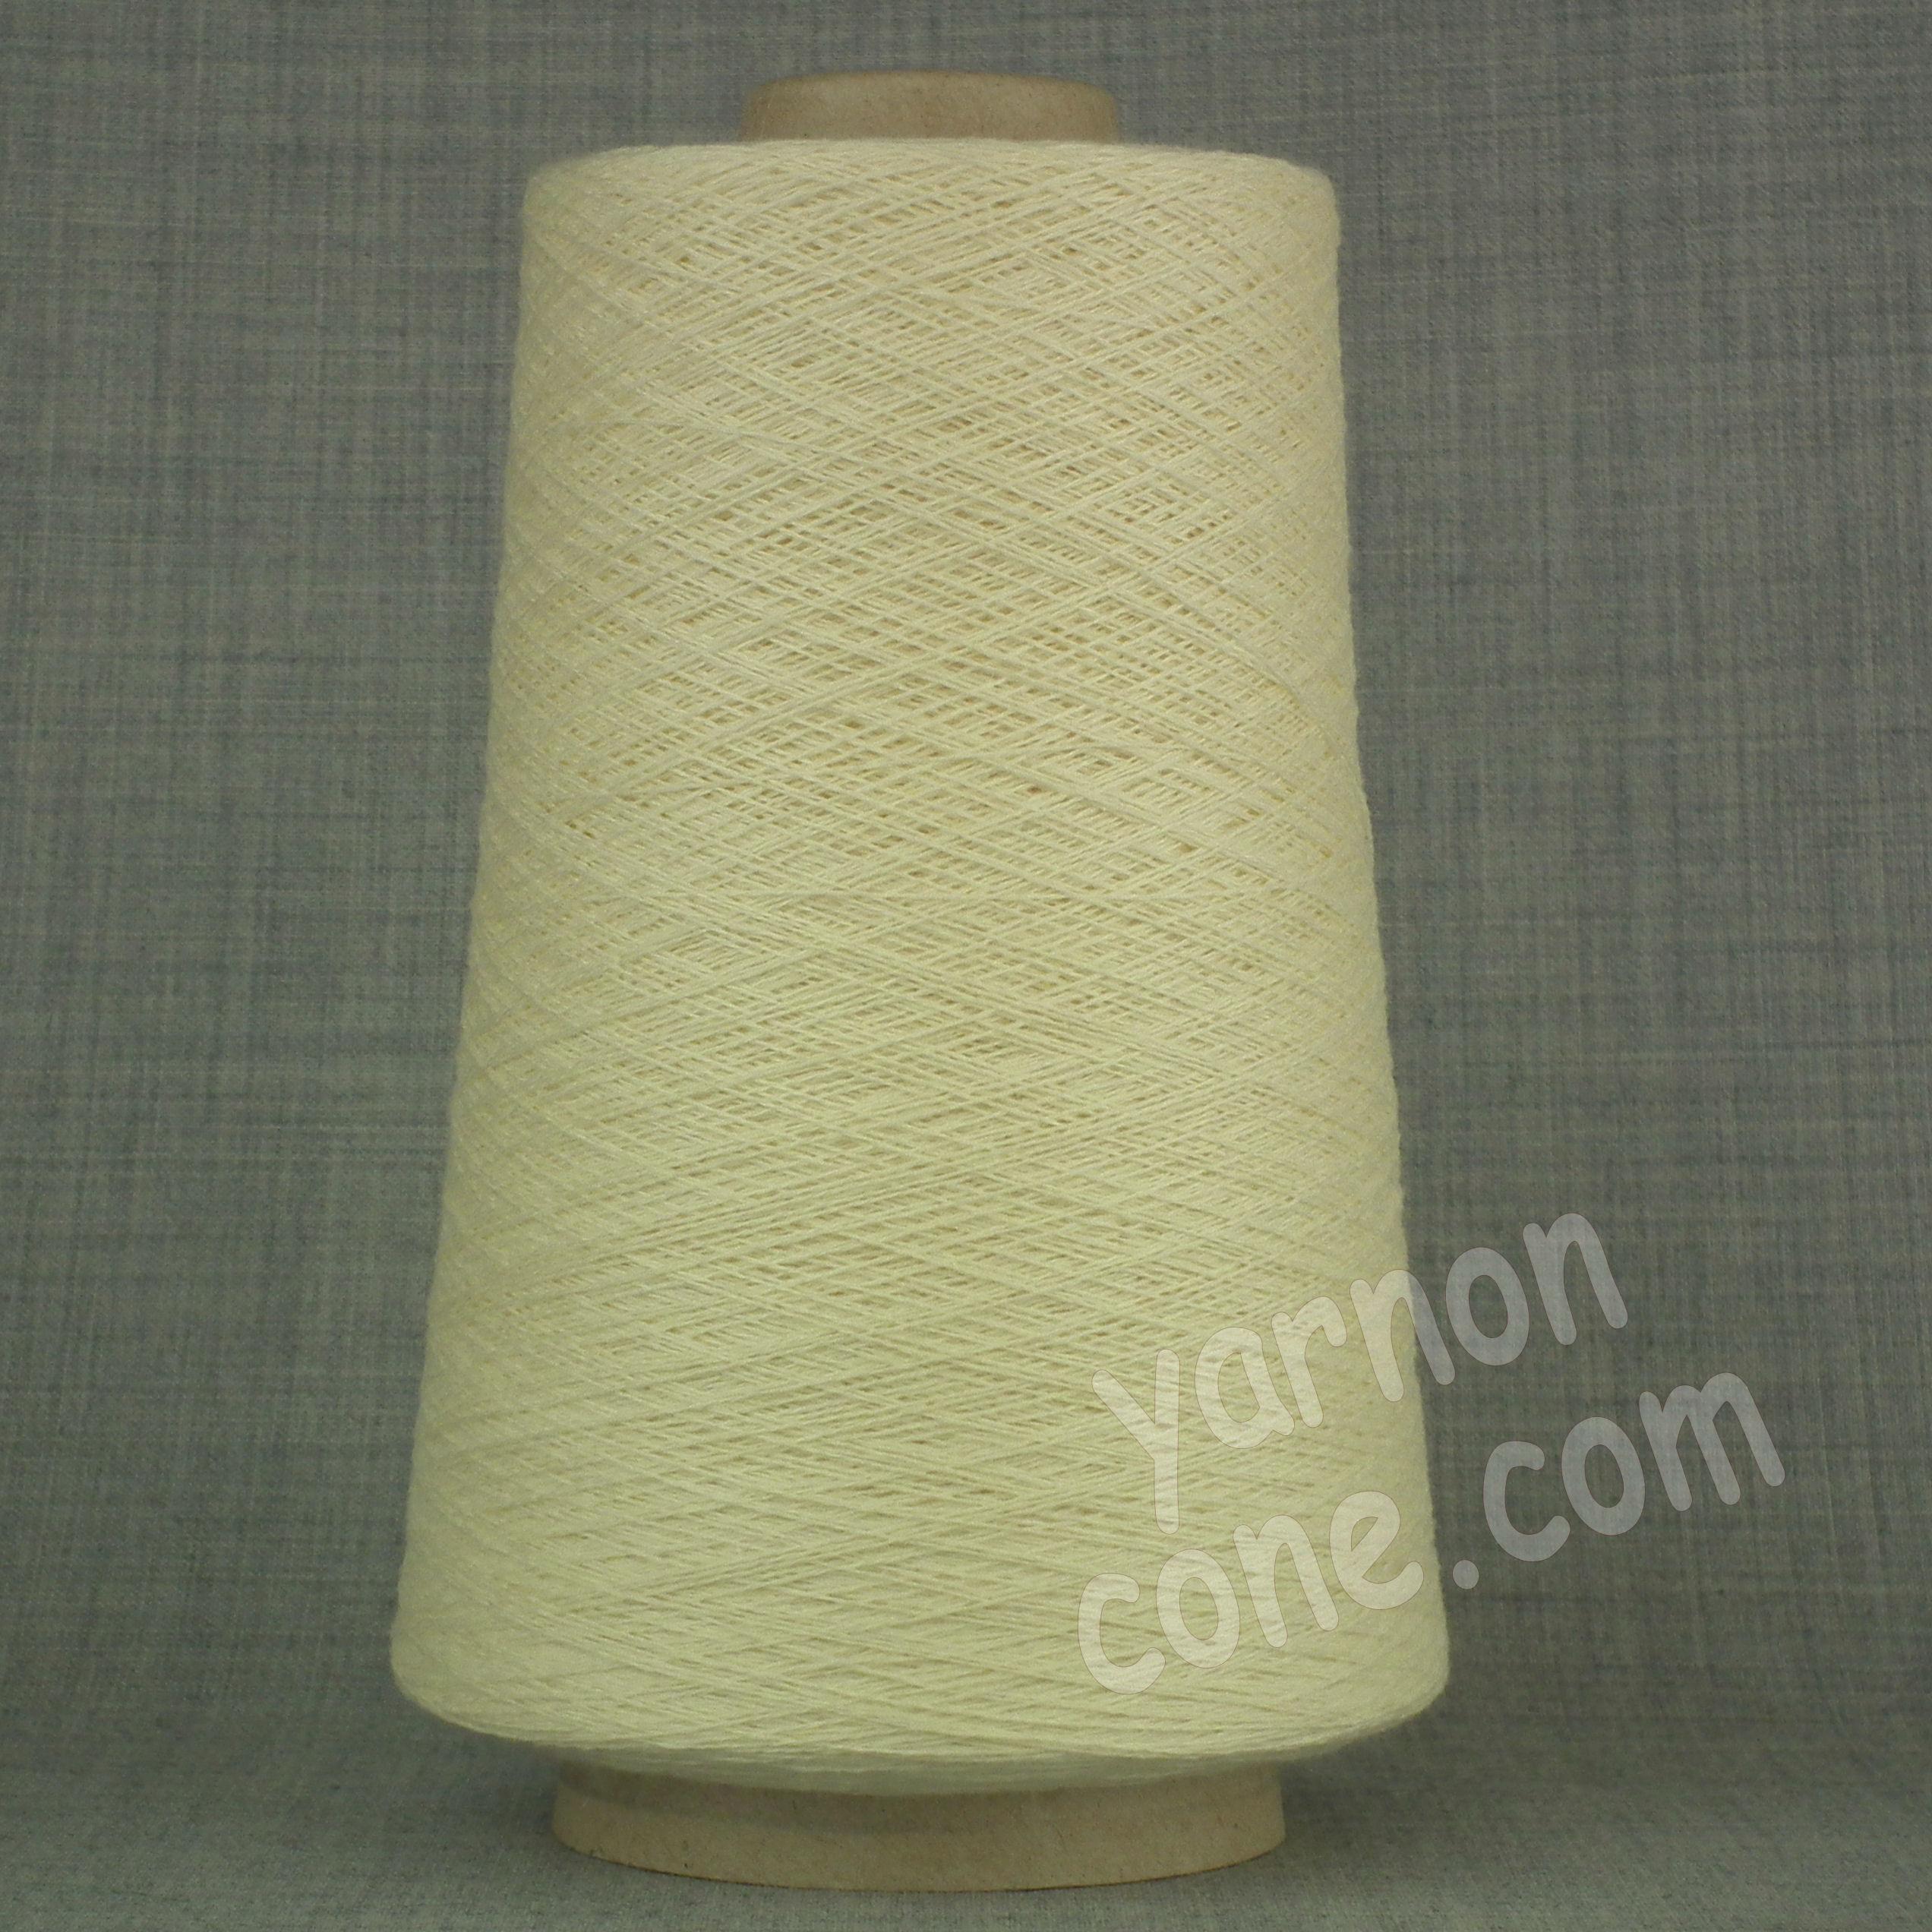 cashmere cotton todd duncan odyssey cone uk knitting soft cream natural ecru